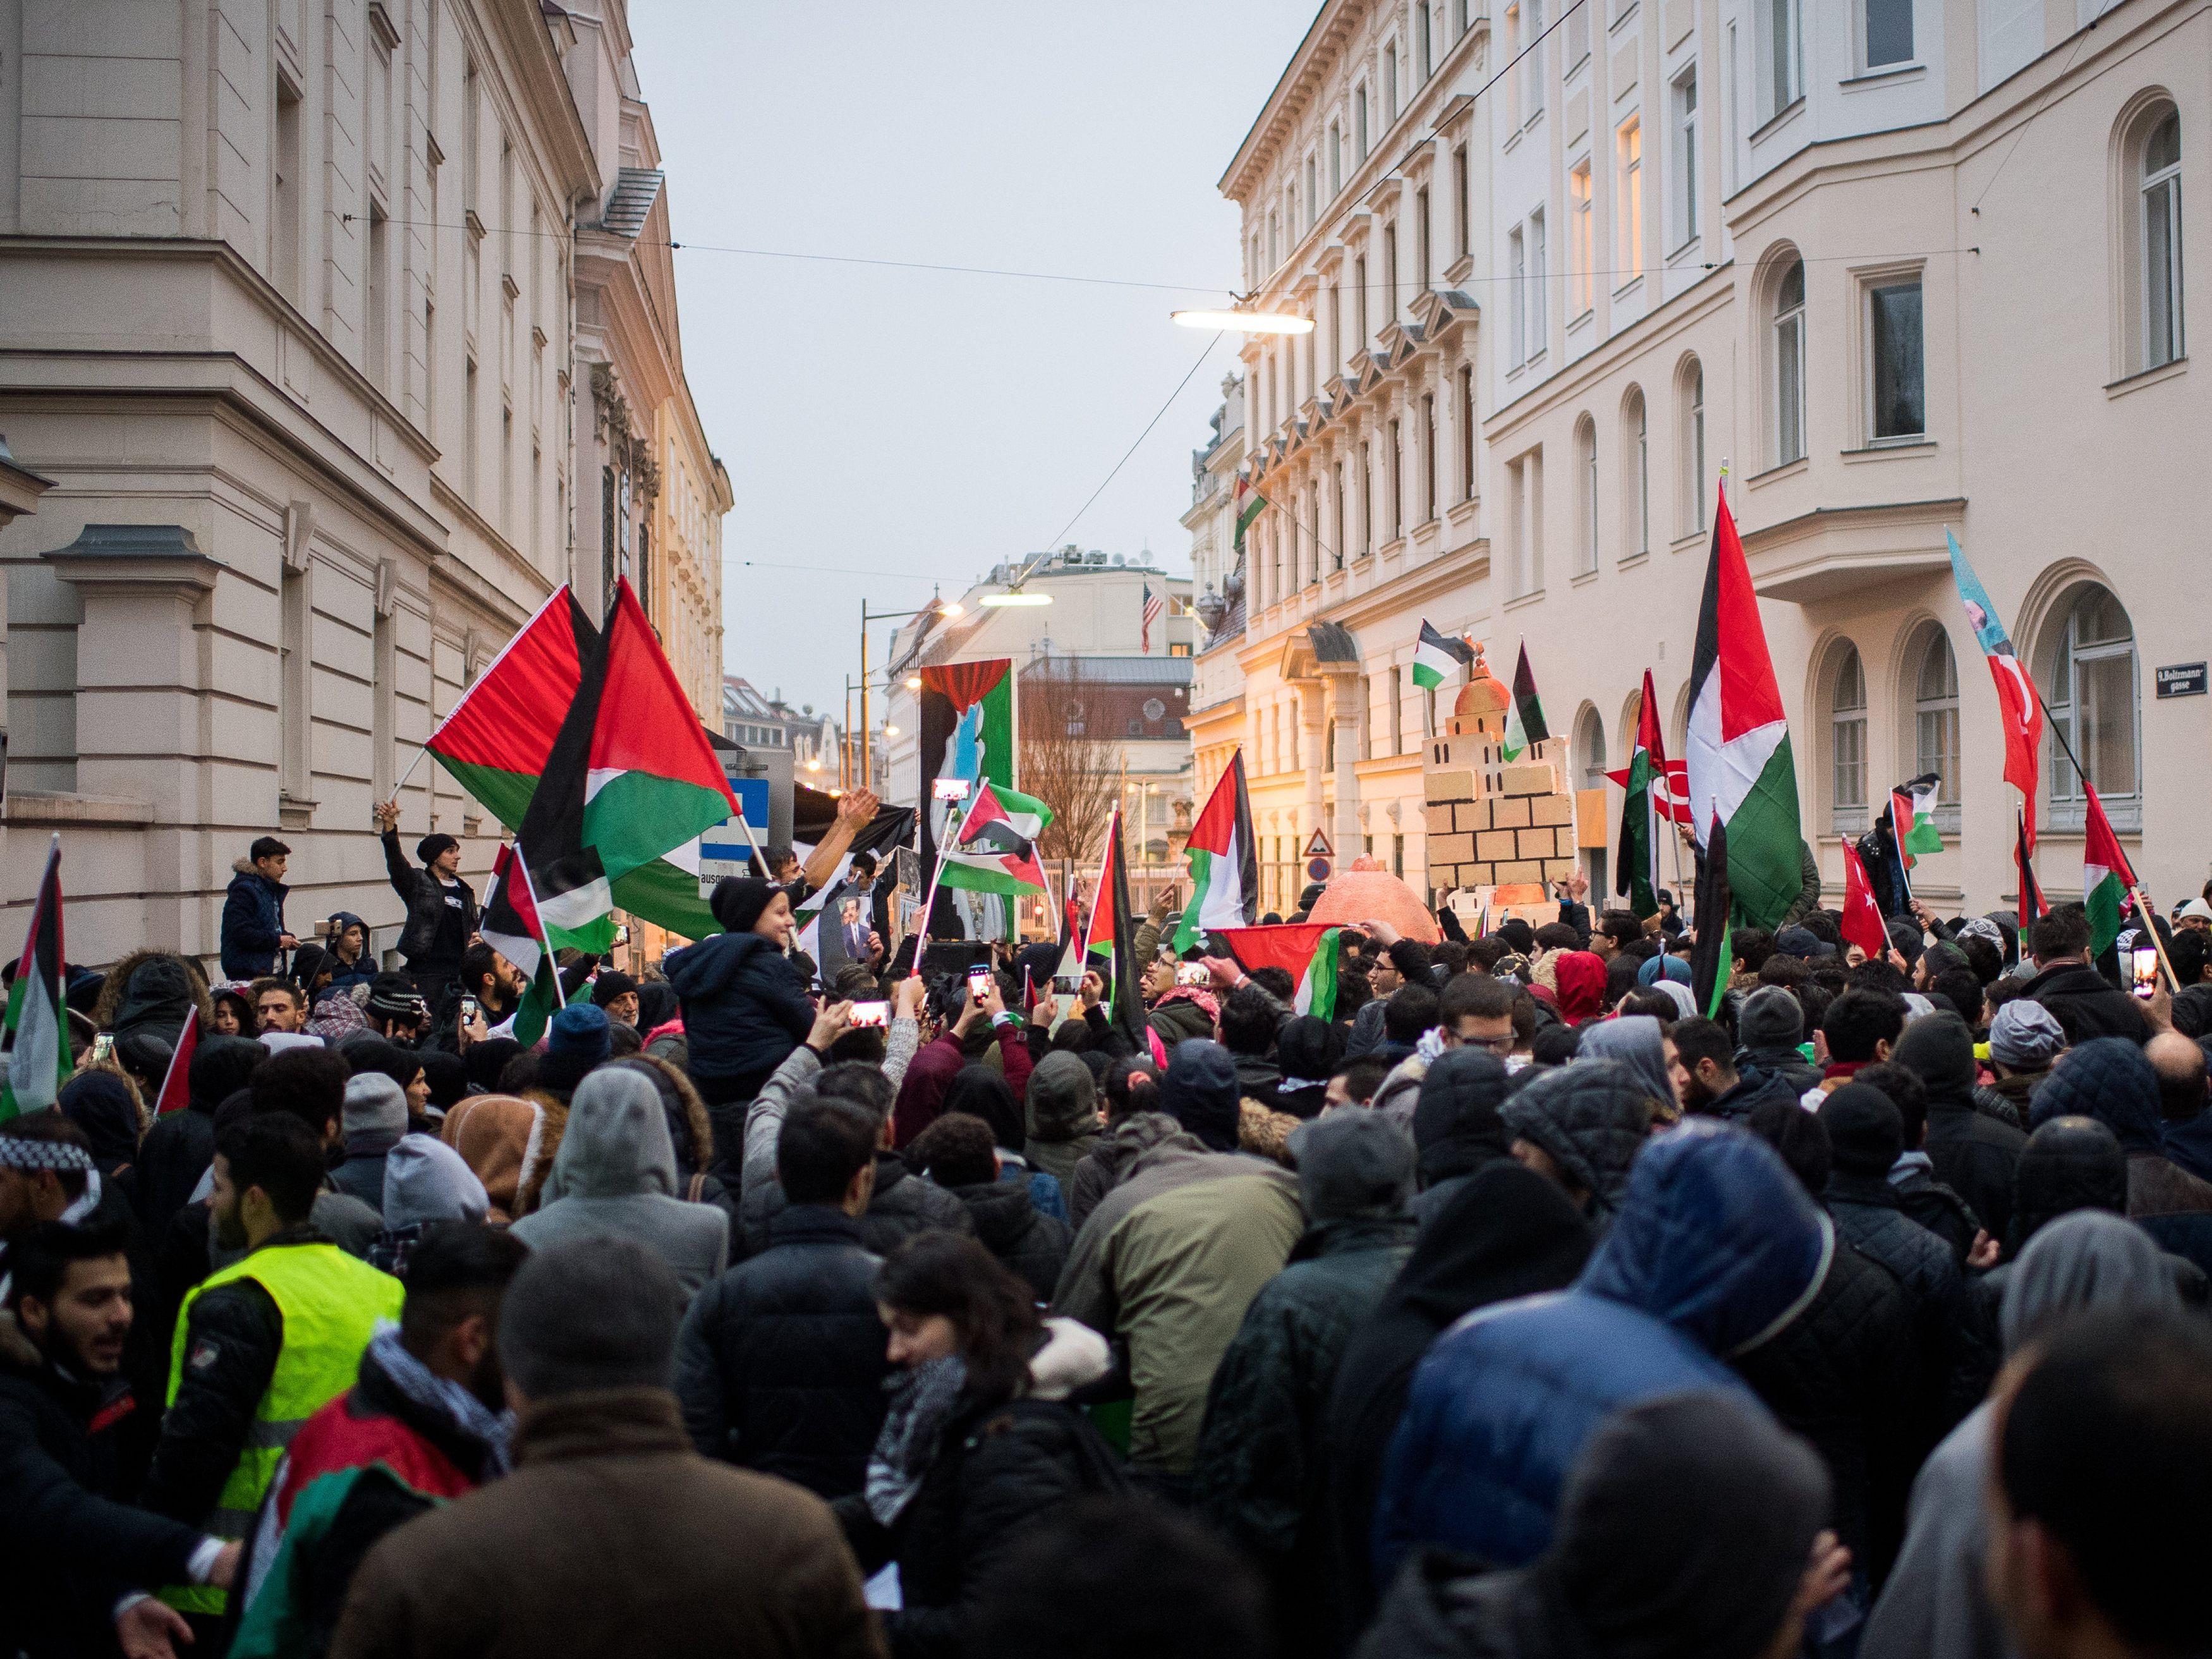 Demo Wien Photo: Jerusalem-Demo In Wien: Erneute Kundgebung Vor US